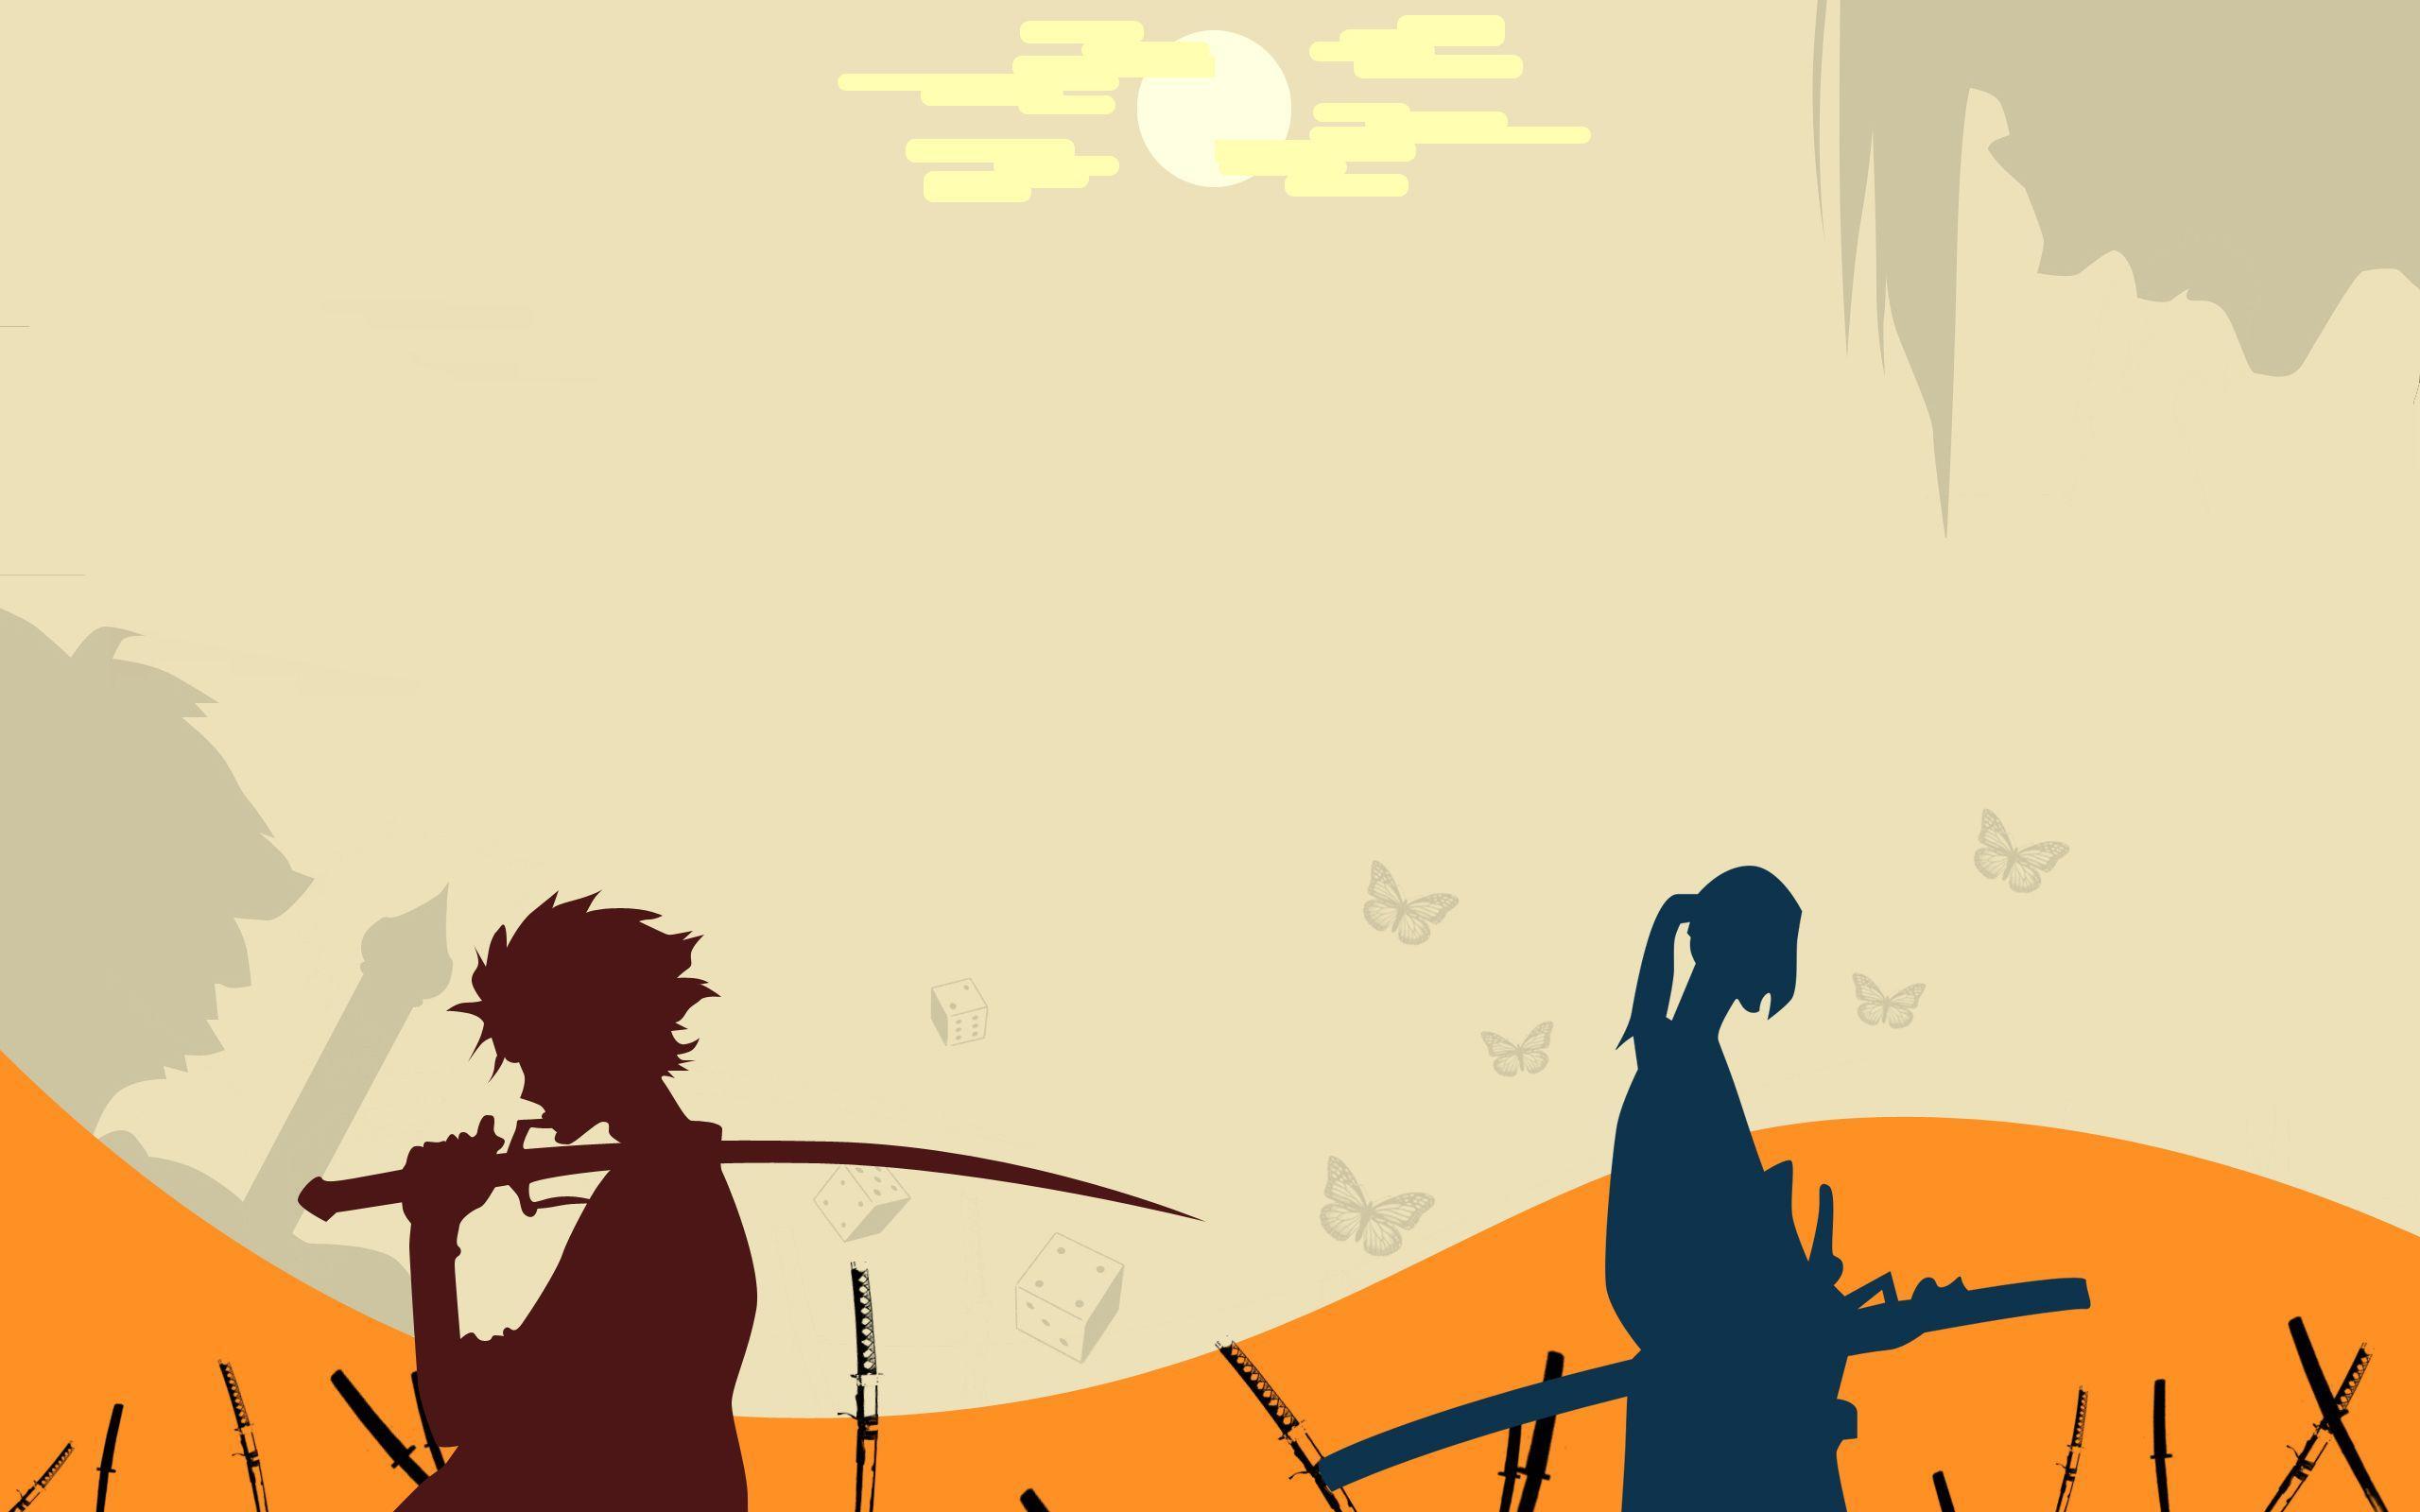 Samurai Champloo Wallpapers Top Free Samurai Champloo Backgrounds Wallpaperaccess